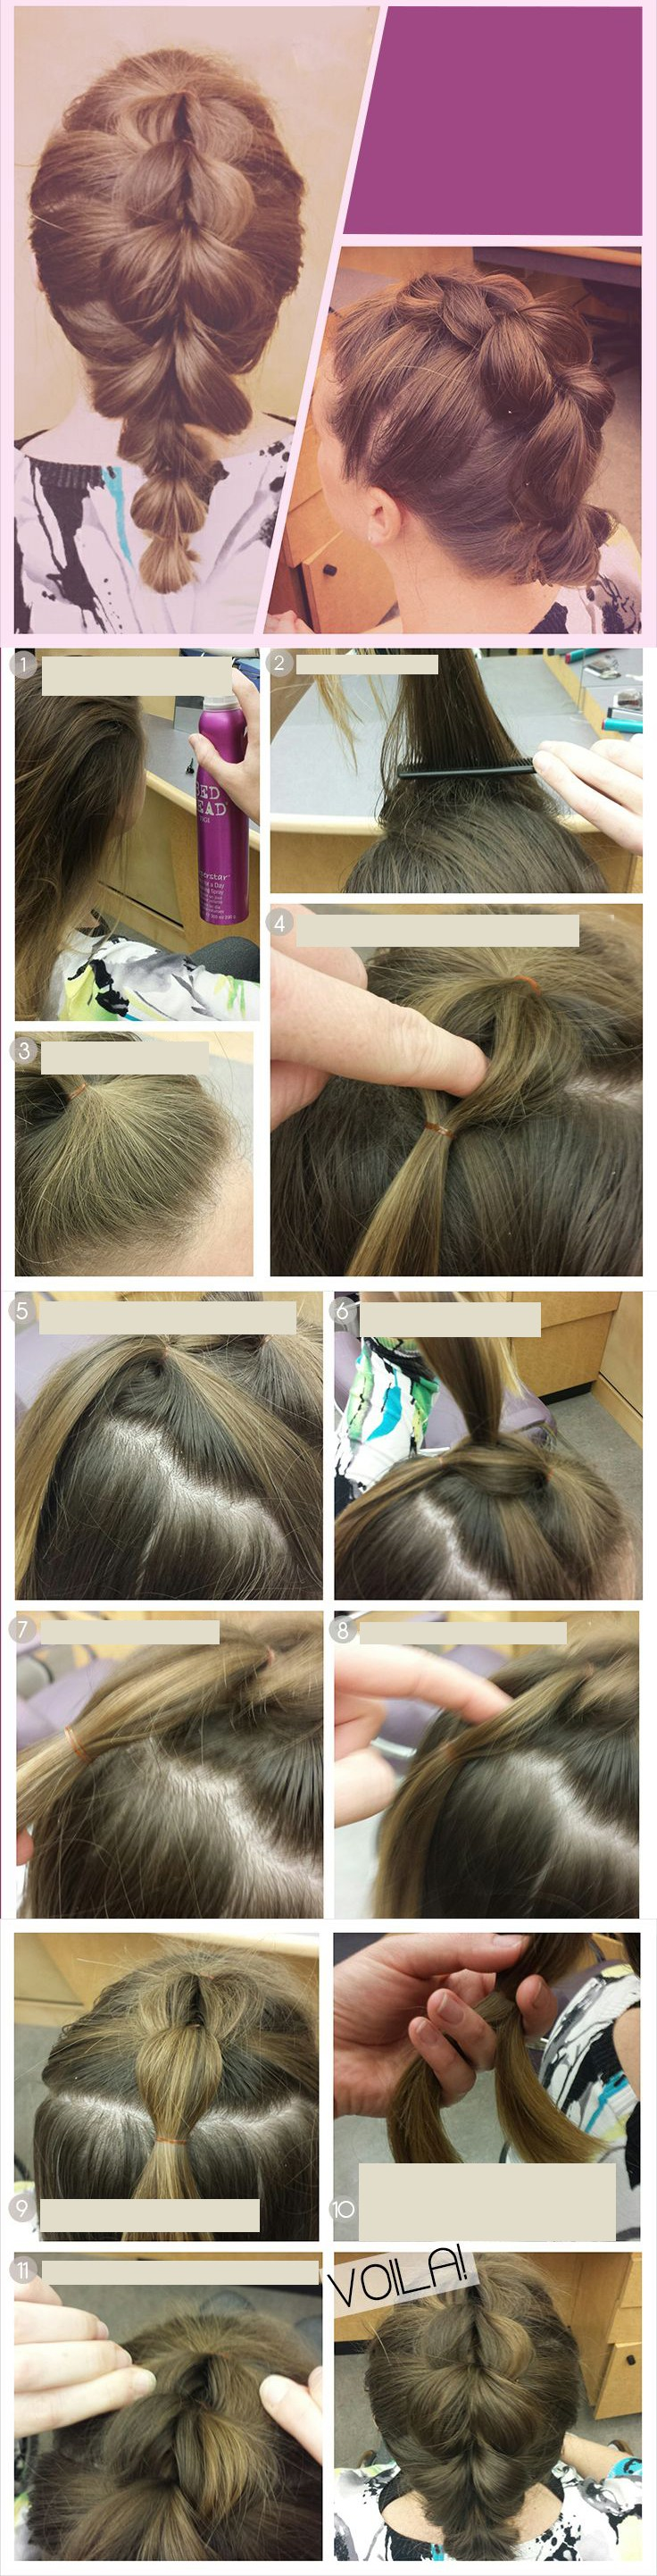 Faux fishbone braid Braided Hairstyles Pinterest Fishbone